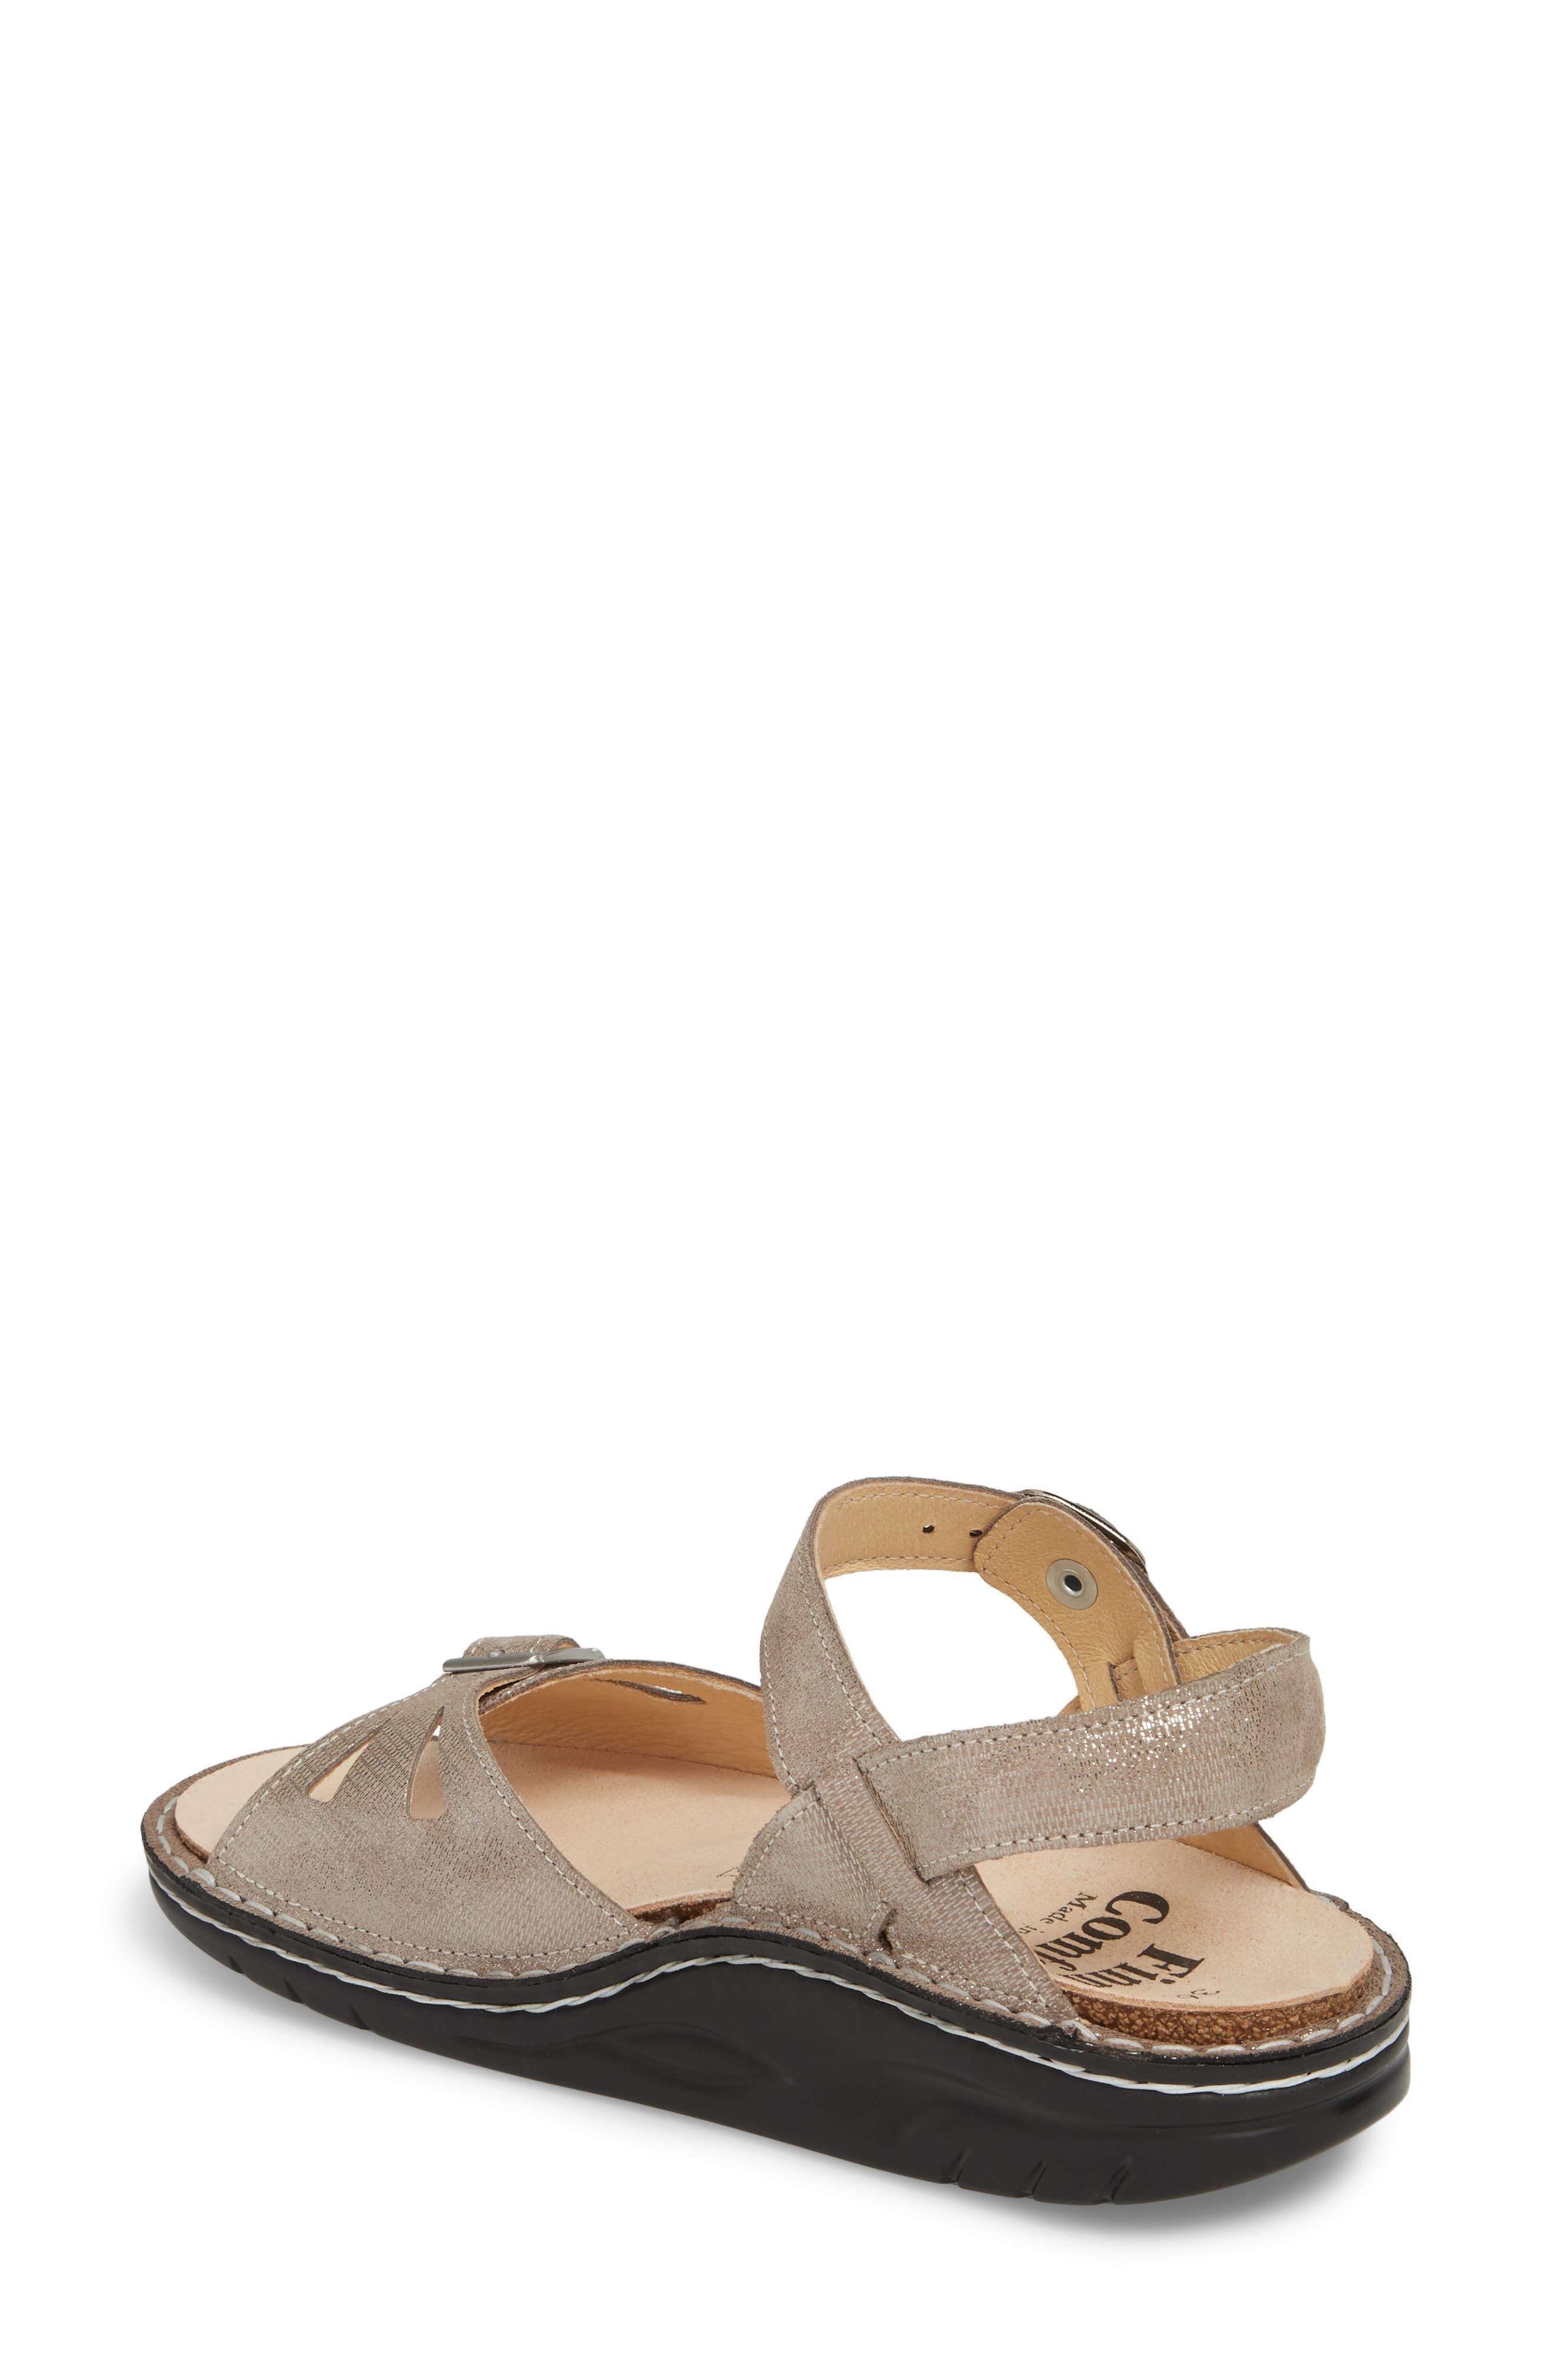 Motomachi Sandal,                             Alternate thumbnail 2, color,                             Fango Leather